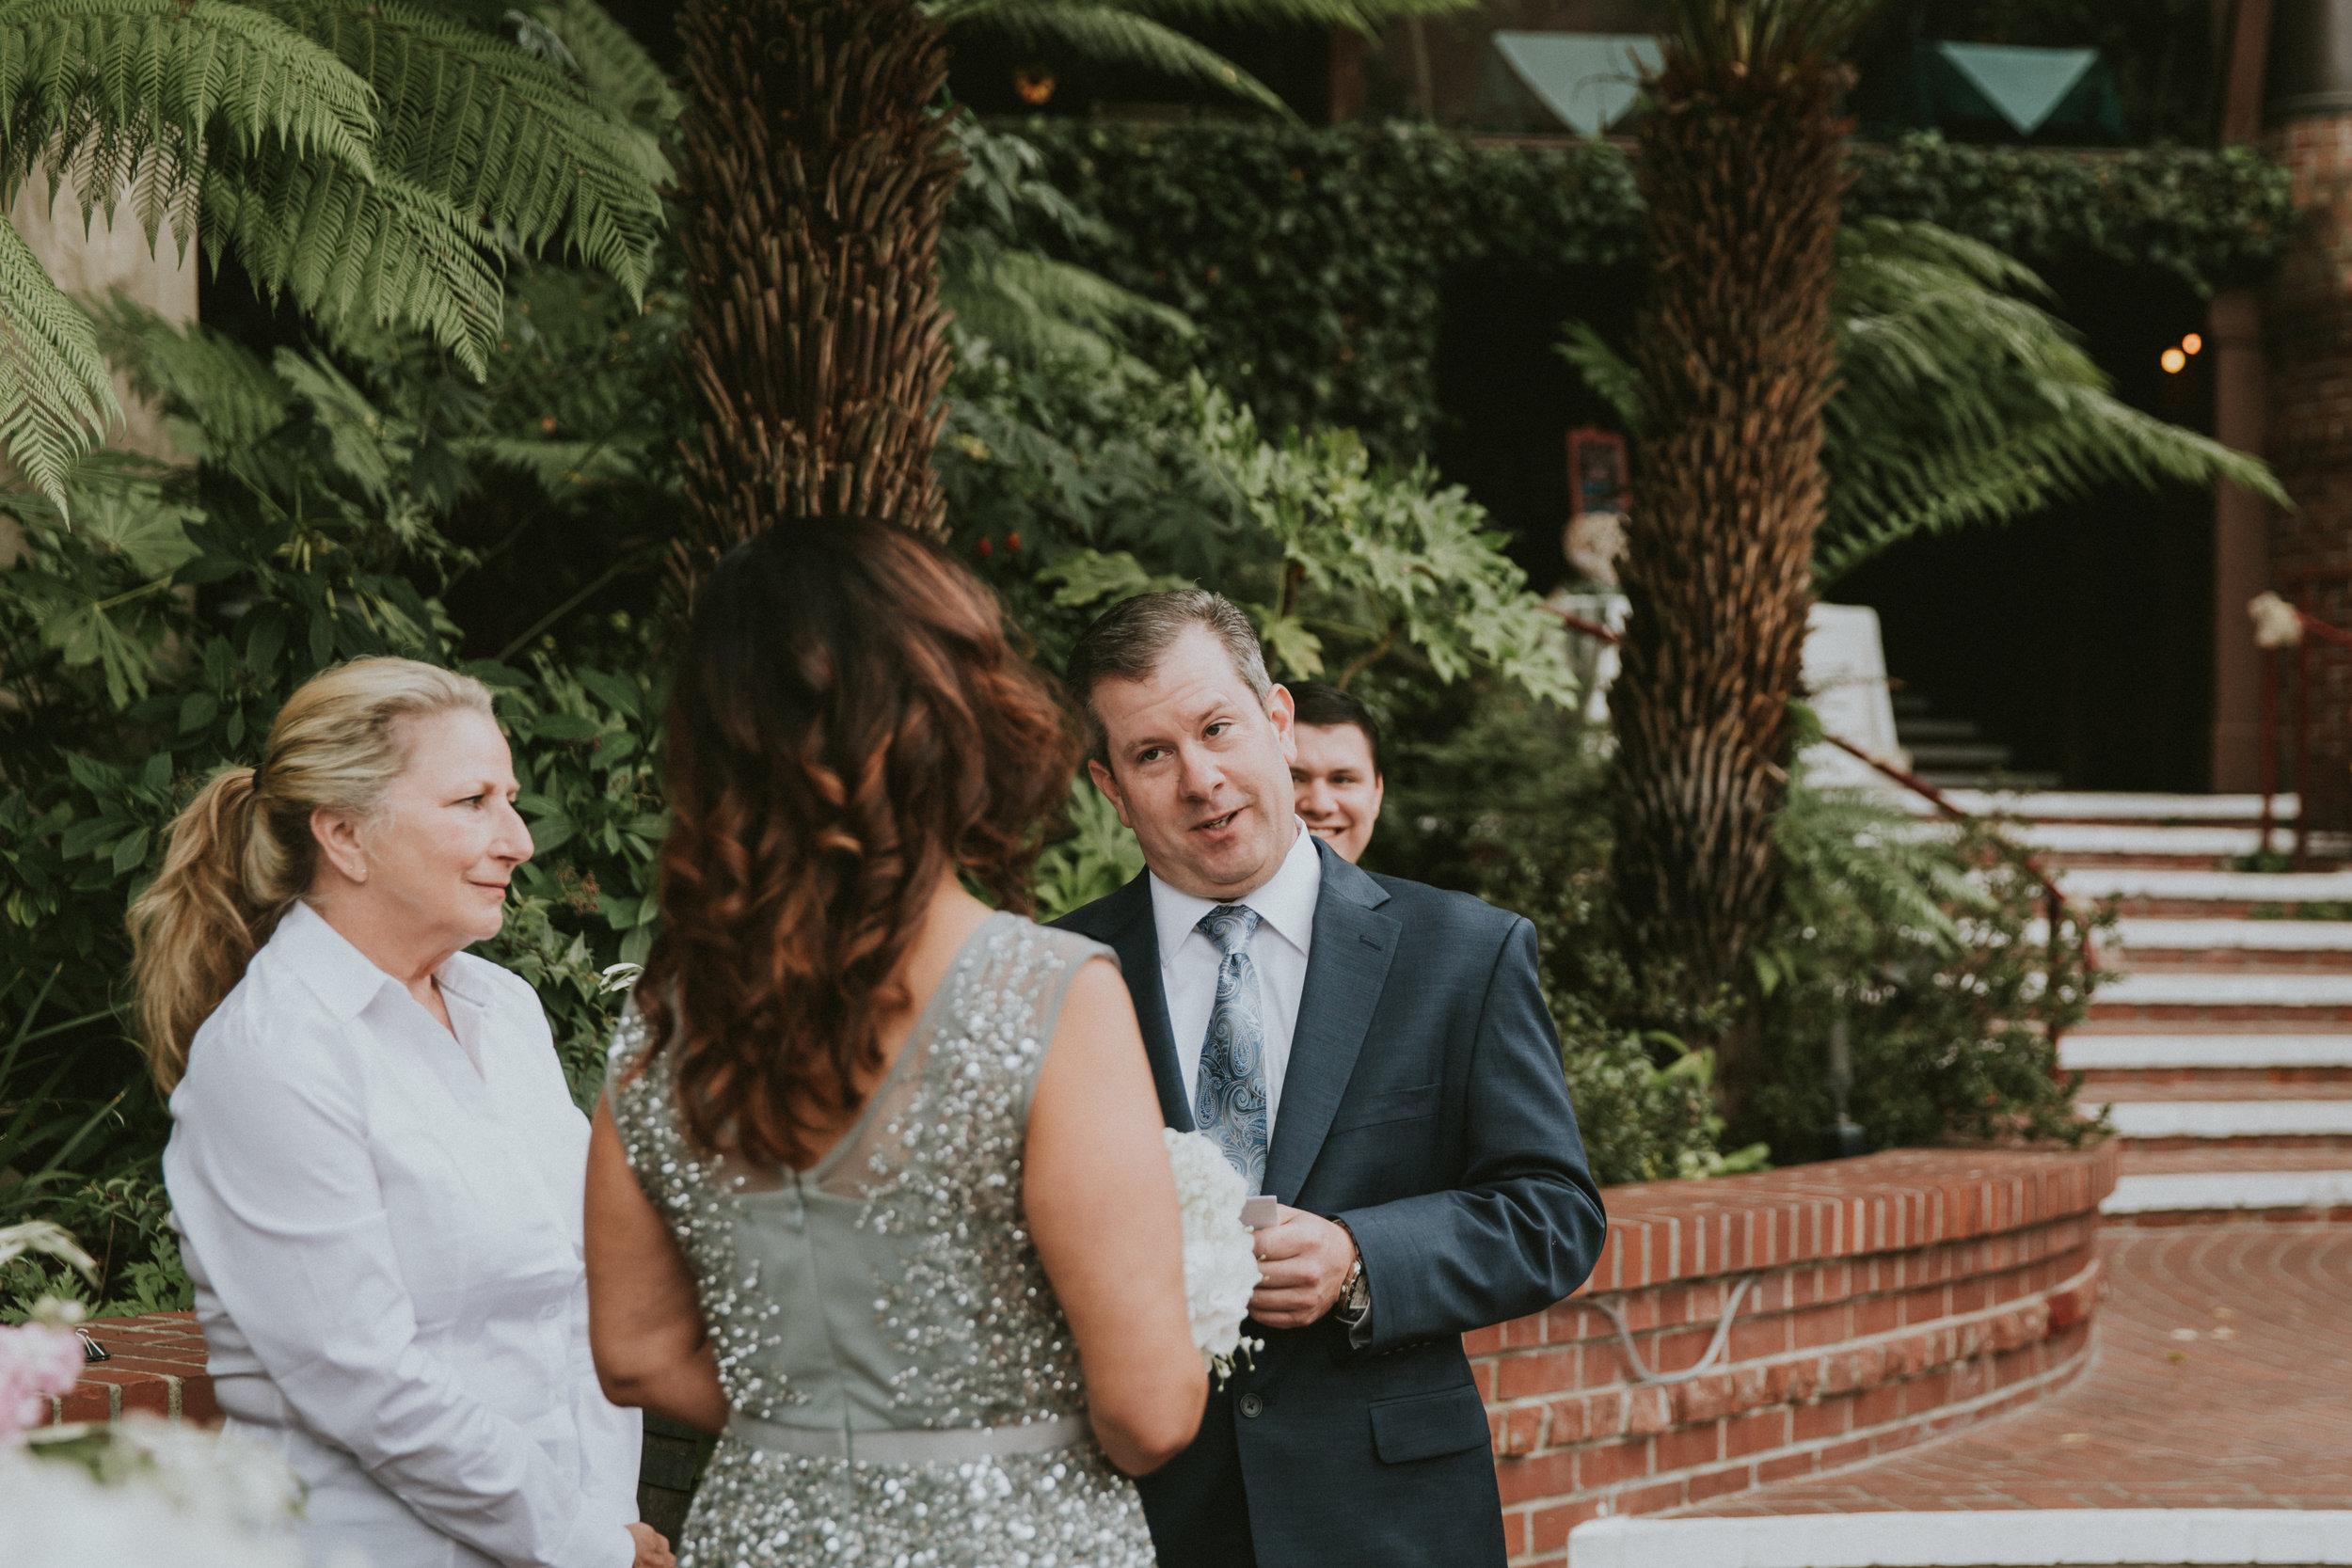 Capitola-Santa-Cruz-wedding-photographer-176.jpg